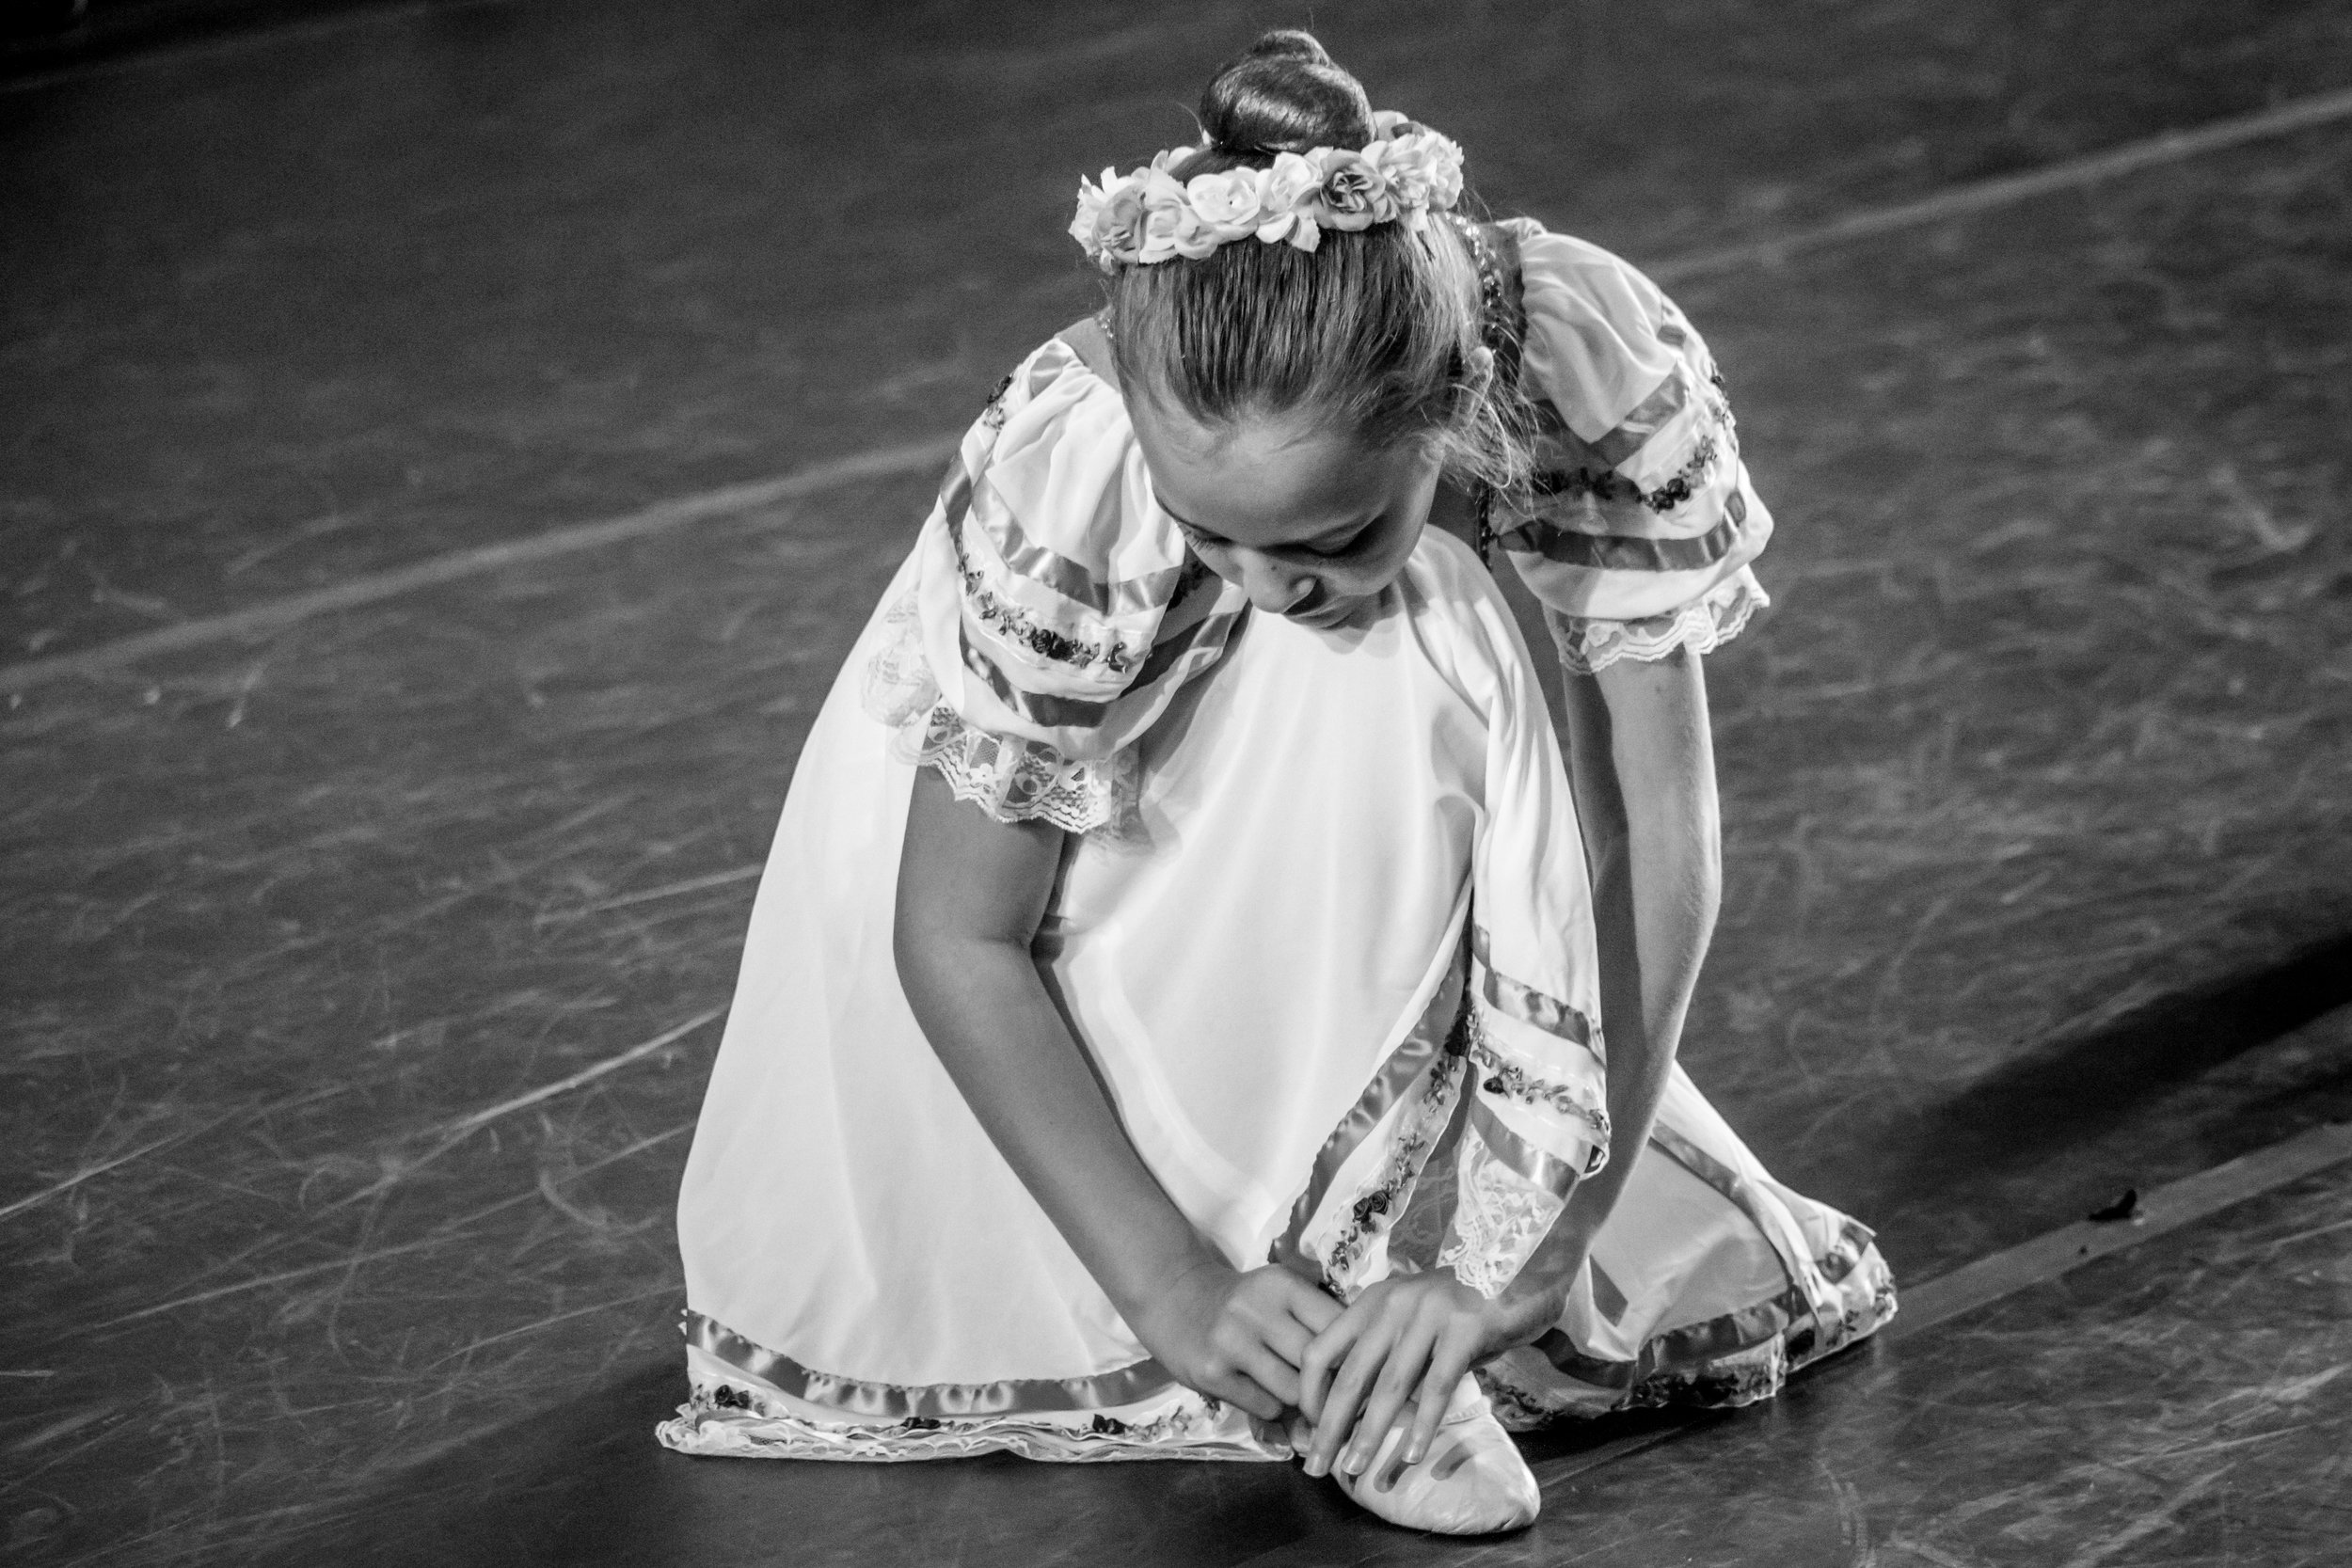 Spring Performance, Texas Ballet Theater School